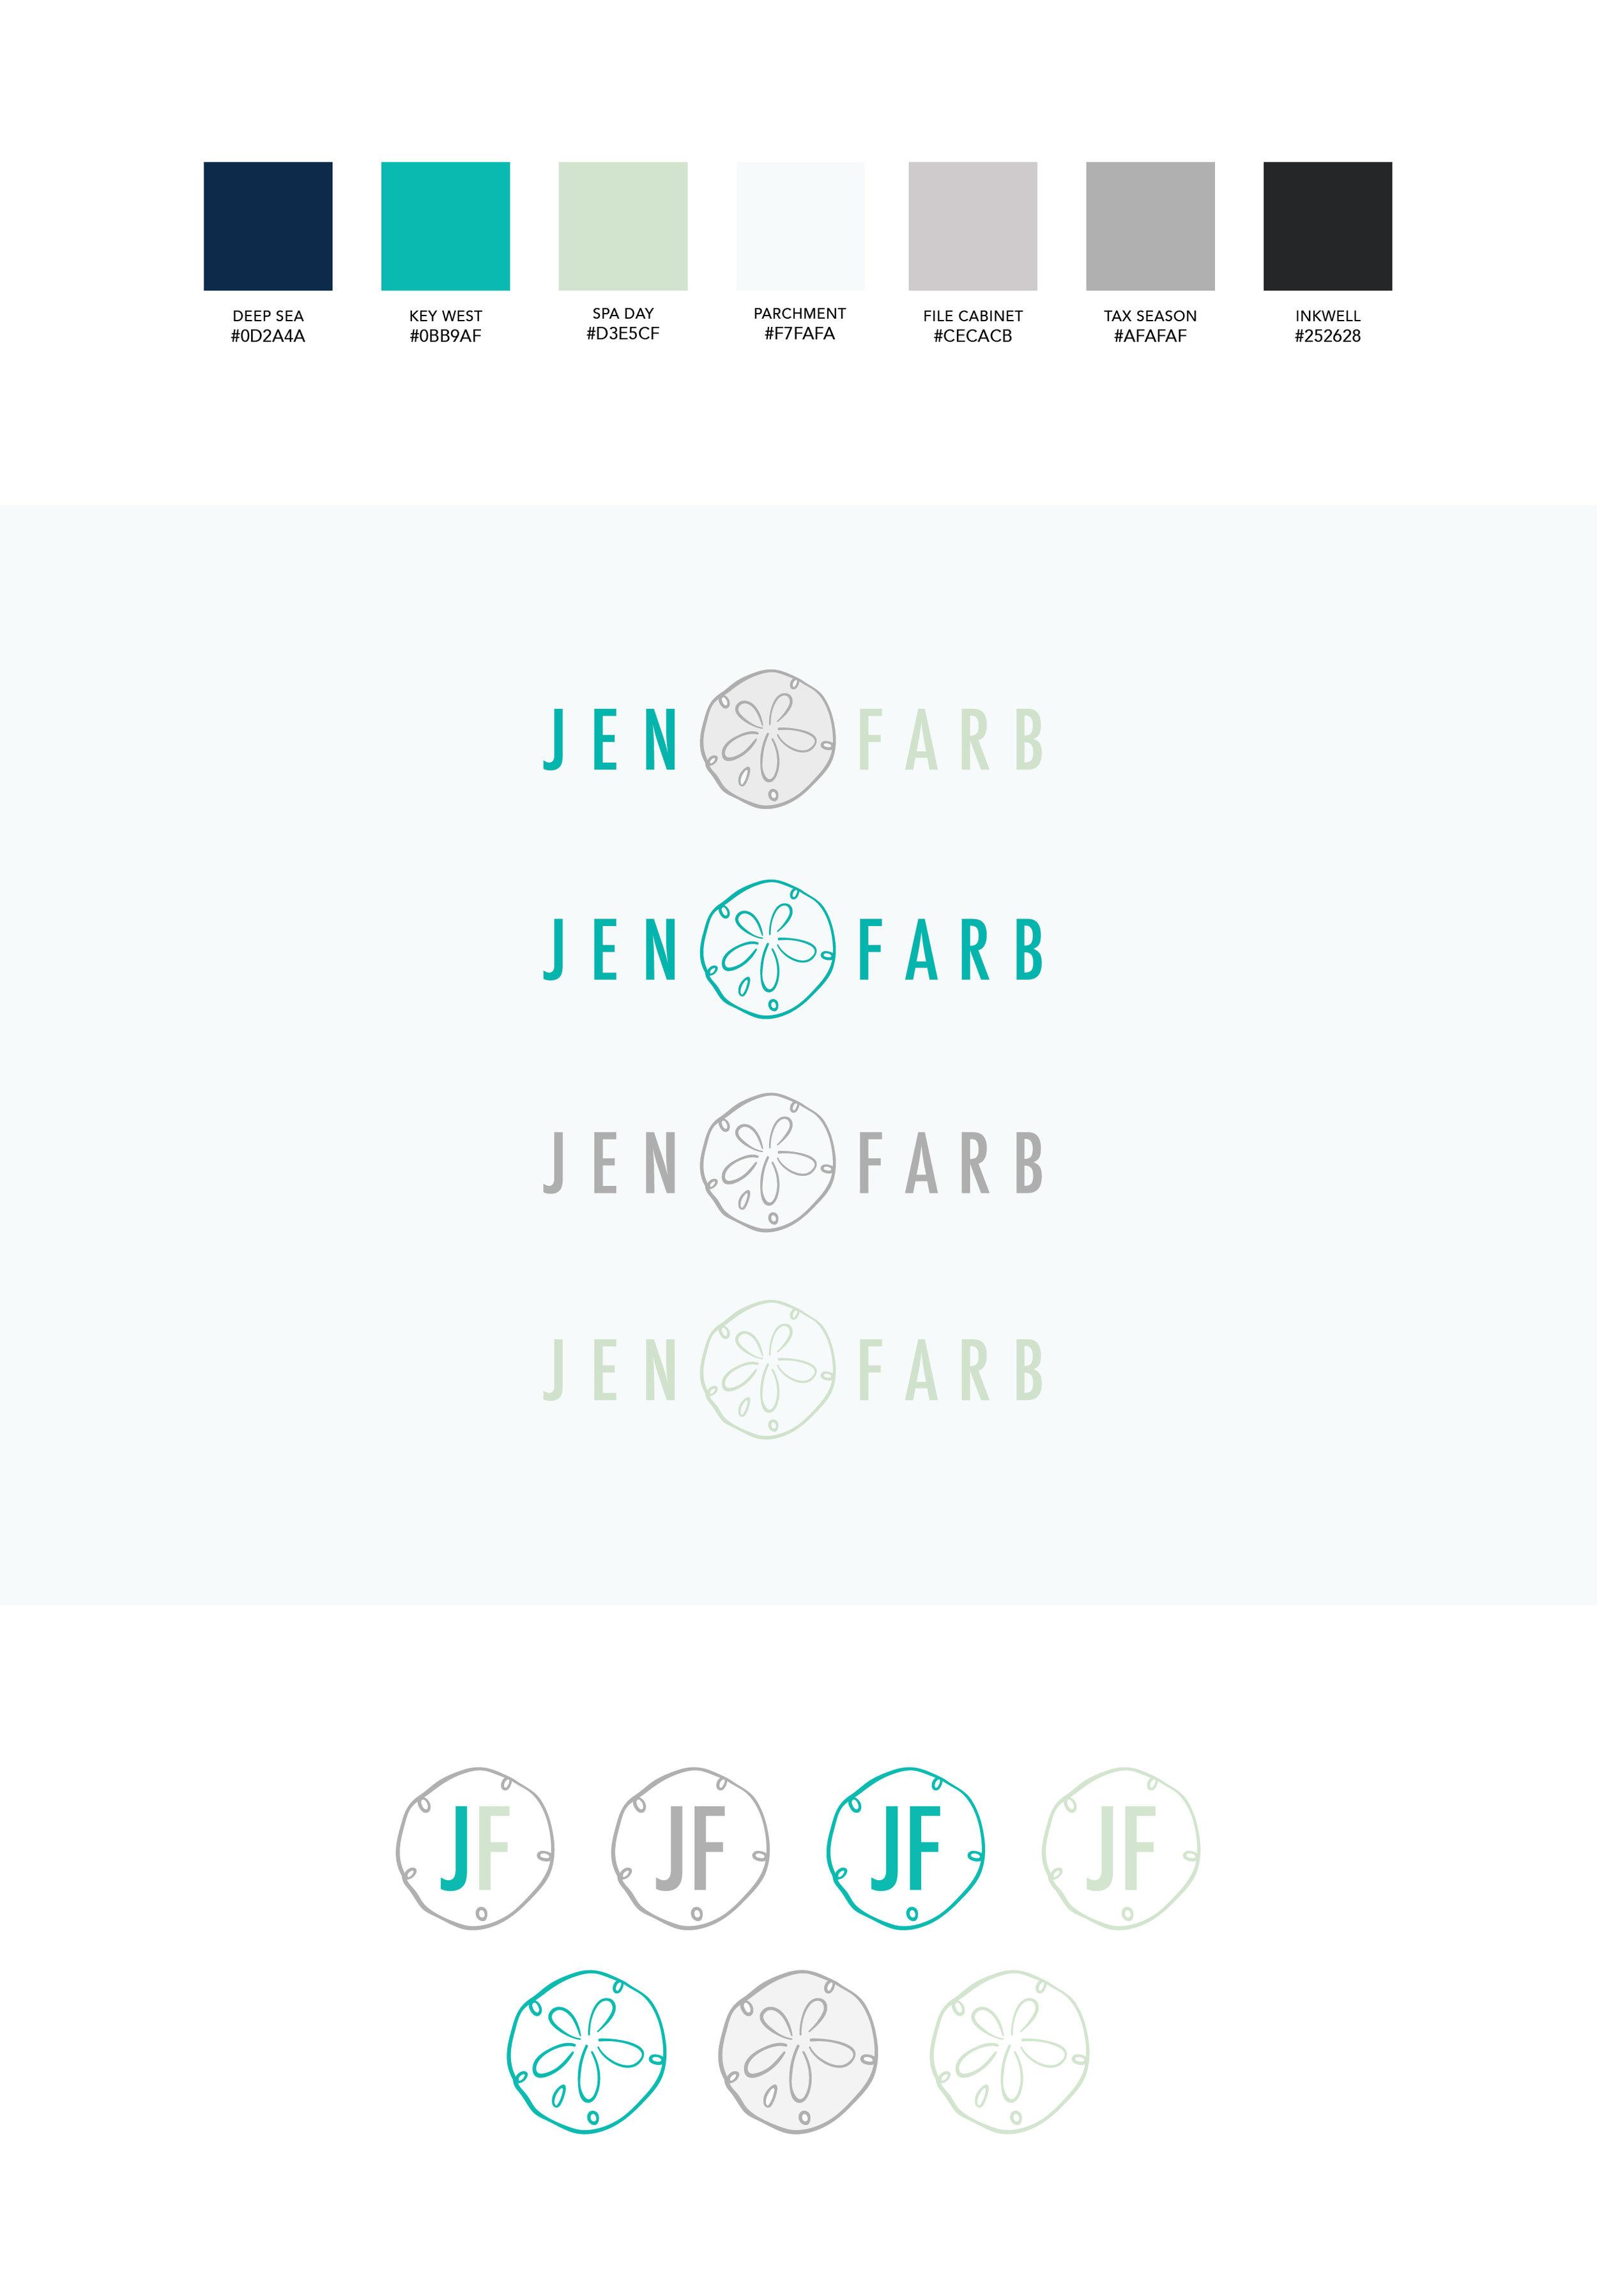 JenFarb_styleguide3.jpg